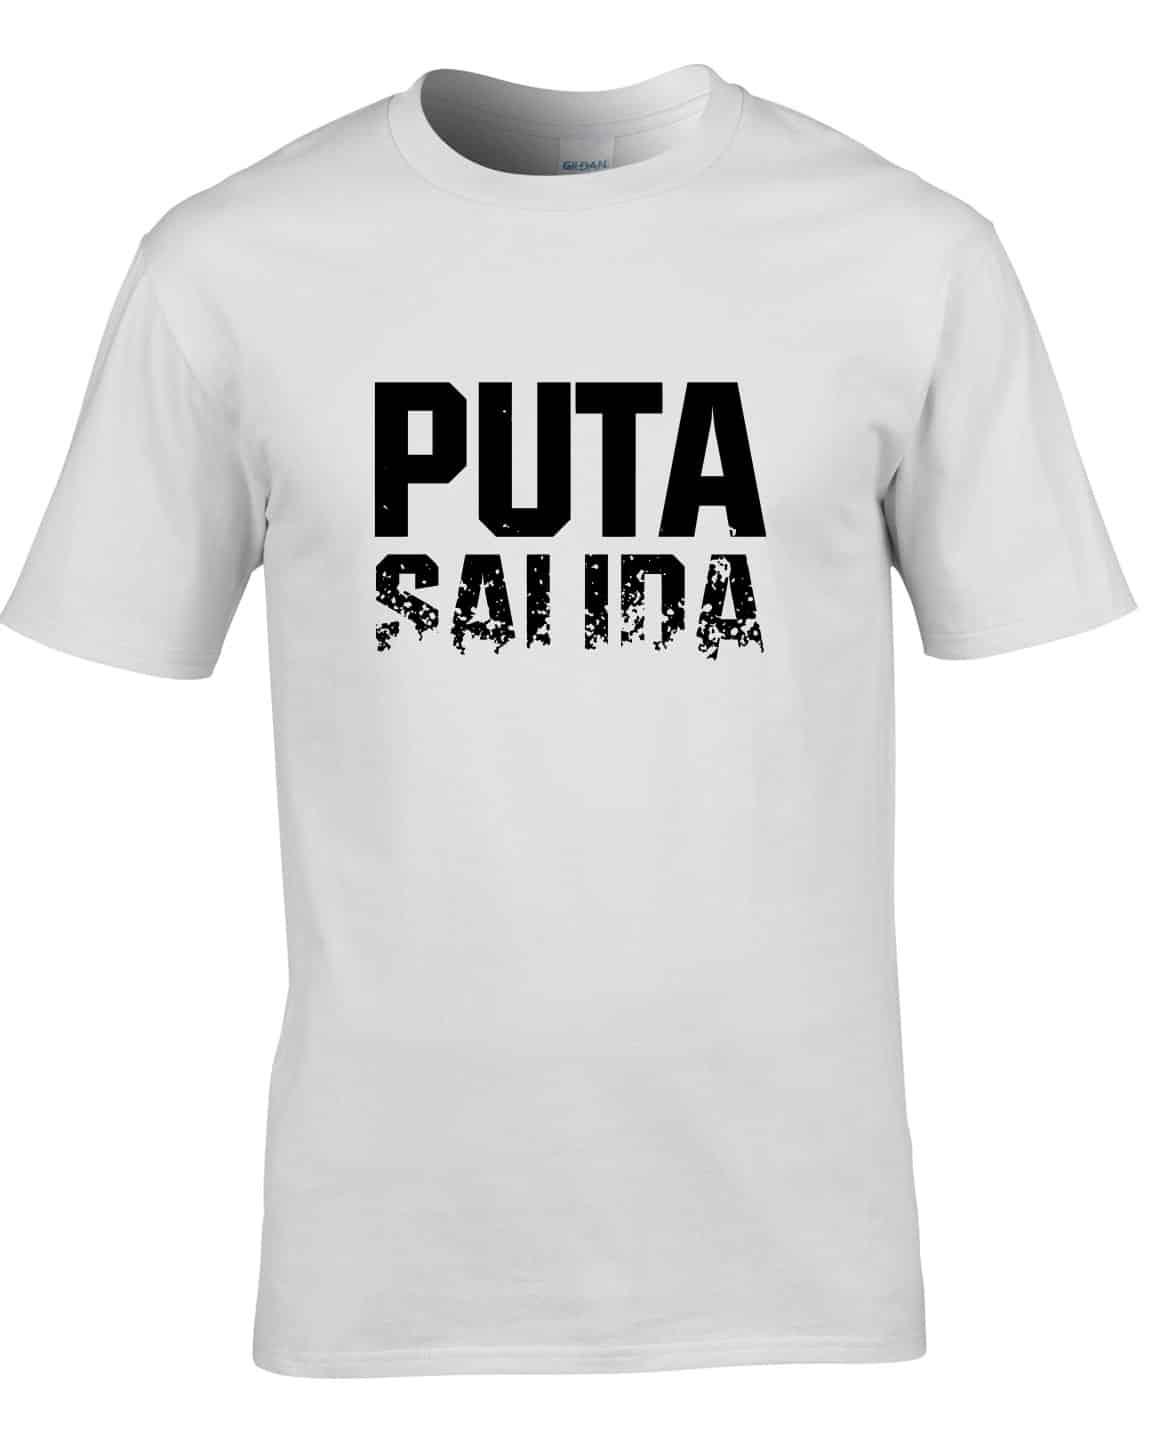 Floc-kings - t-shirt événementiel Puta Salida